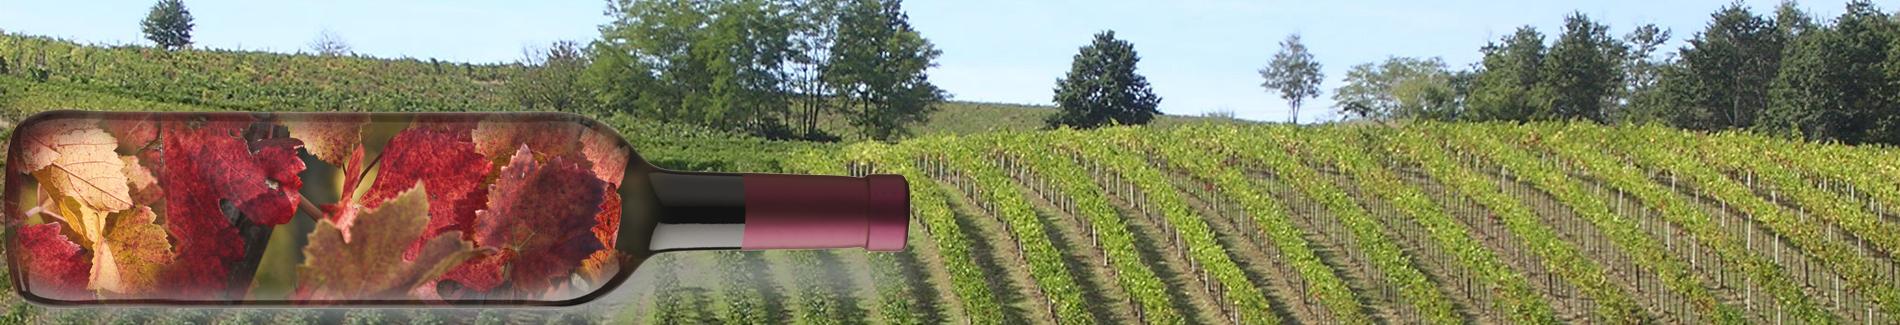 Autentico Oltrepò: vini e spumanti Oltrepò Pavese